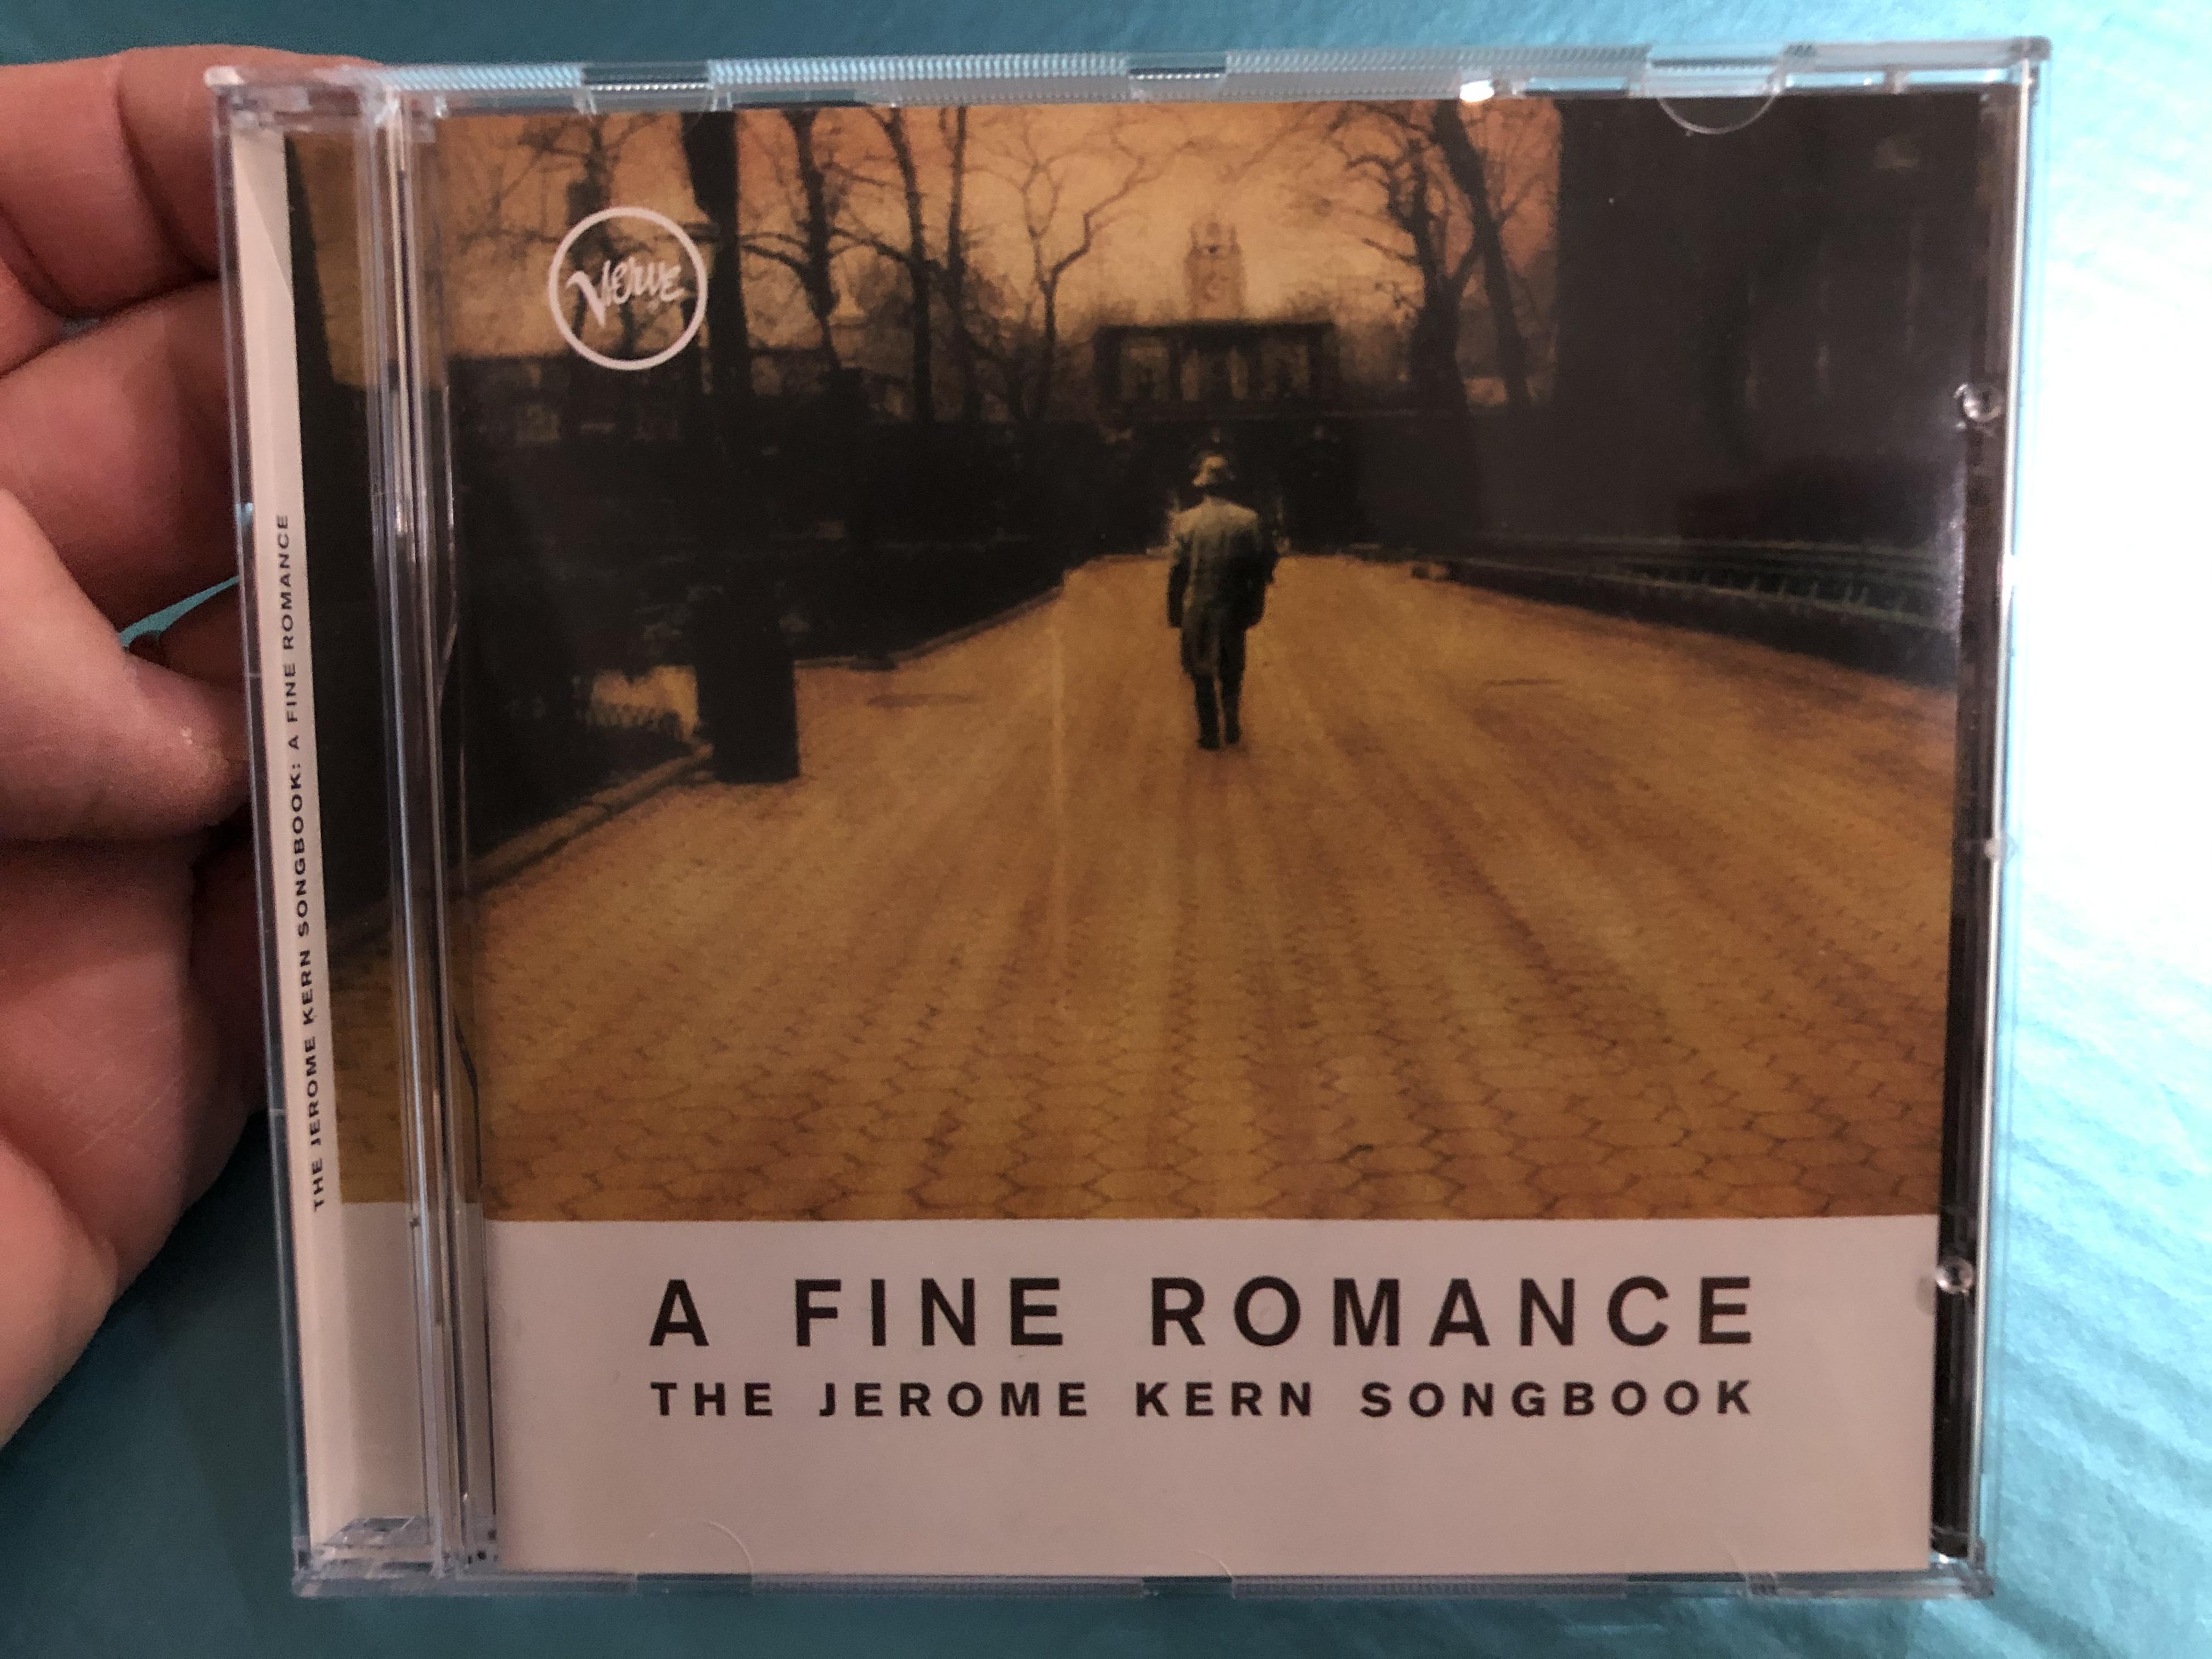 a-fine-romance-the-jerome-kern-songbook-verve-records-audio-cd-1994-523-827-2-1-.jpg